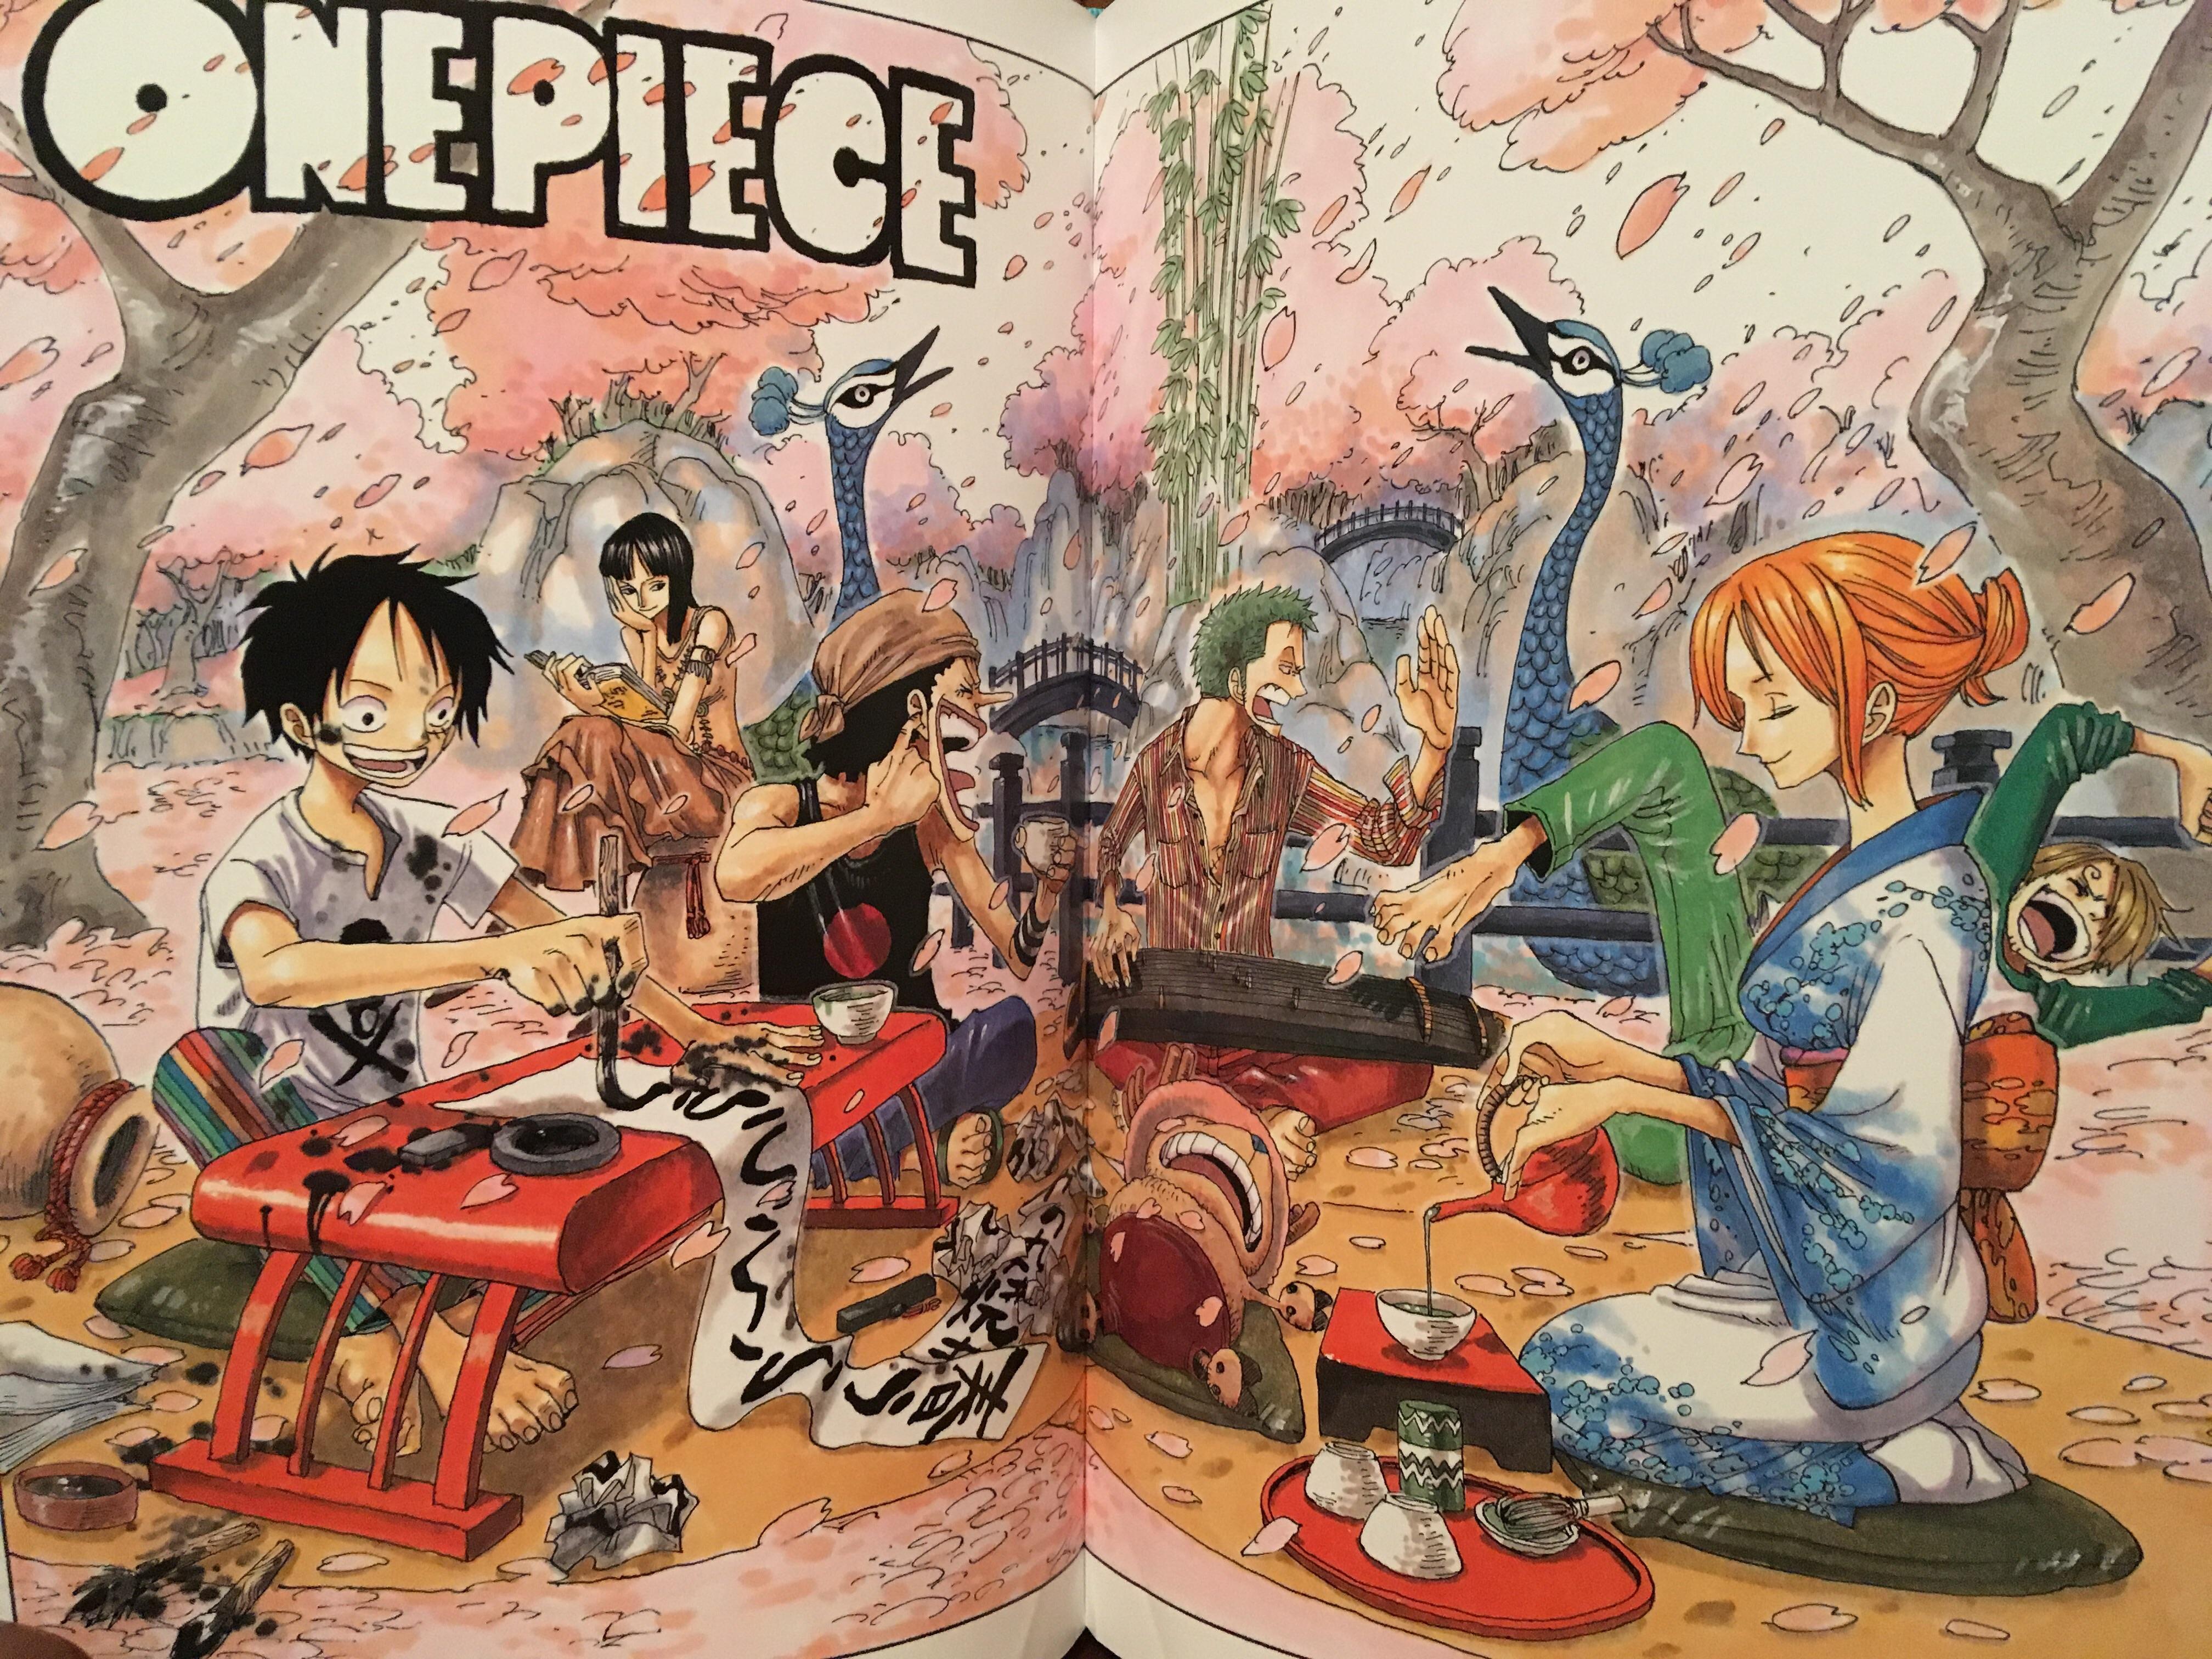 Luffy in land of wano fighting whit kaido   •one piece• amino. One Piece Wano Arc Wallpaper - Freewallanime